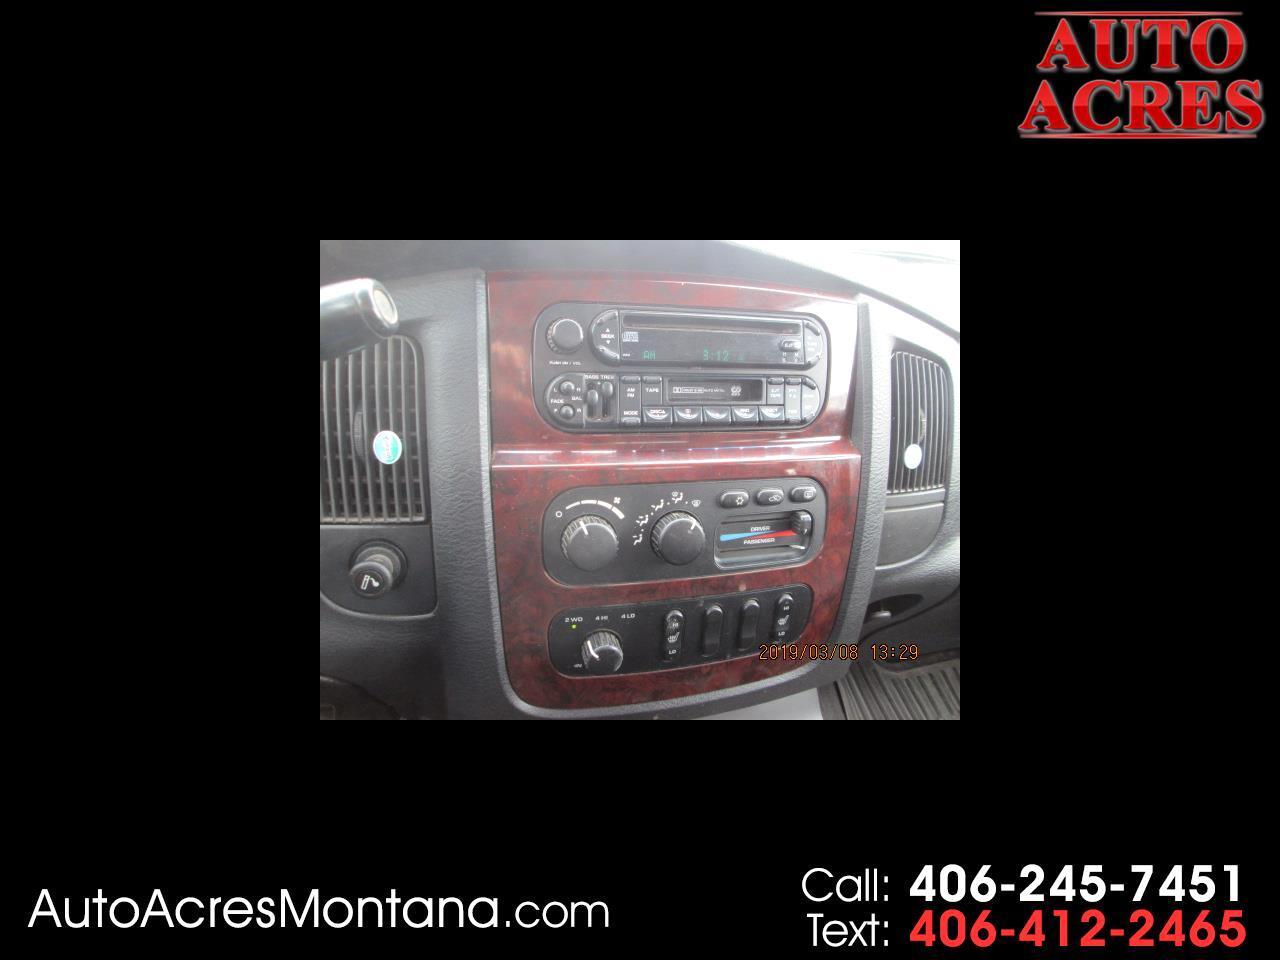 "2003 Dodge Ram 3500 4dr Quad Cab 160.5"" WB DRW 4WD SLT"